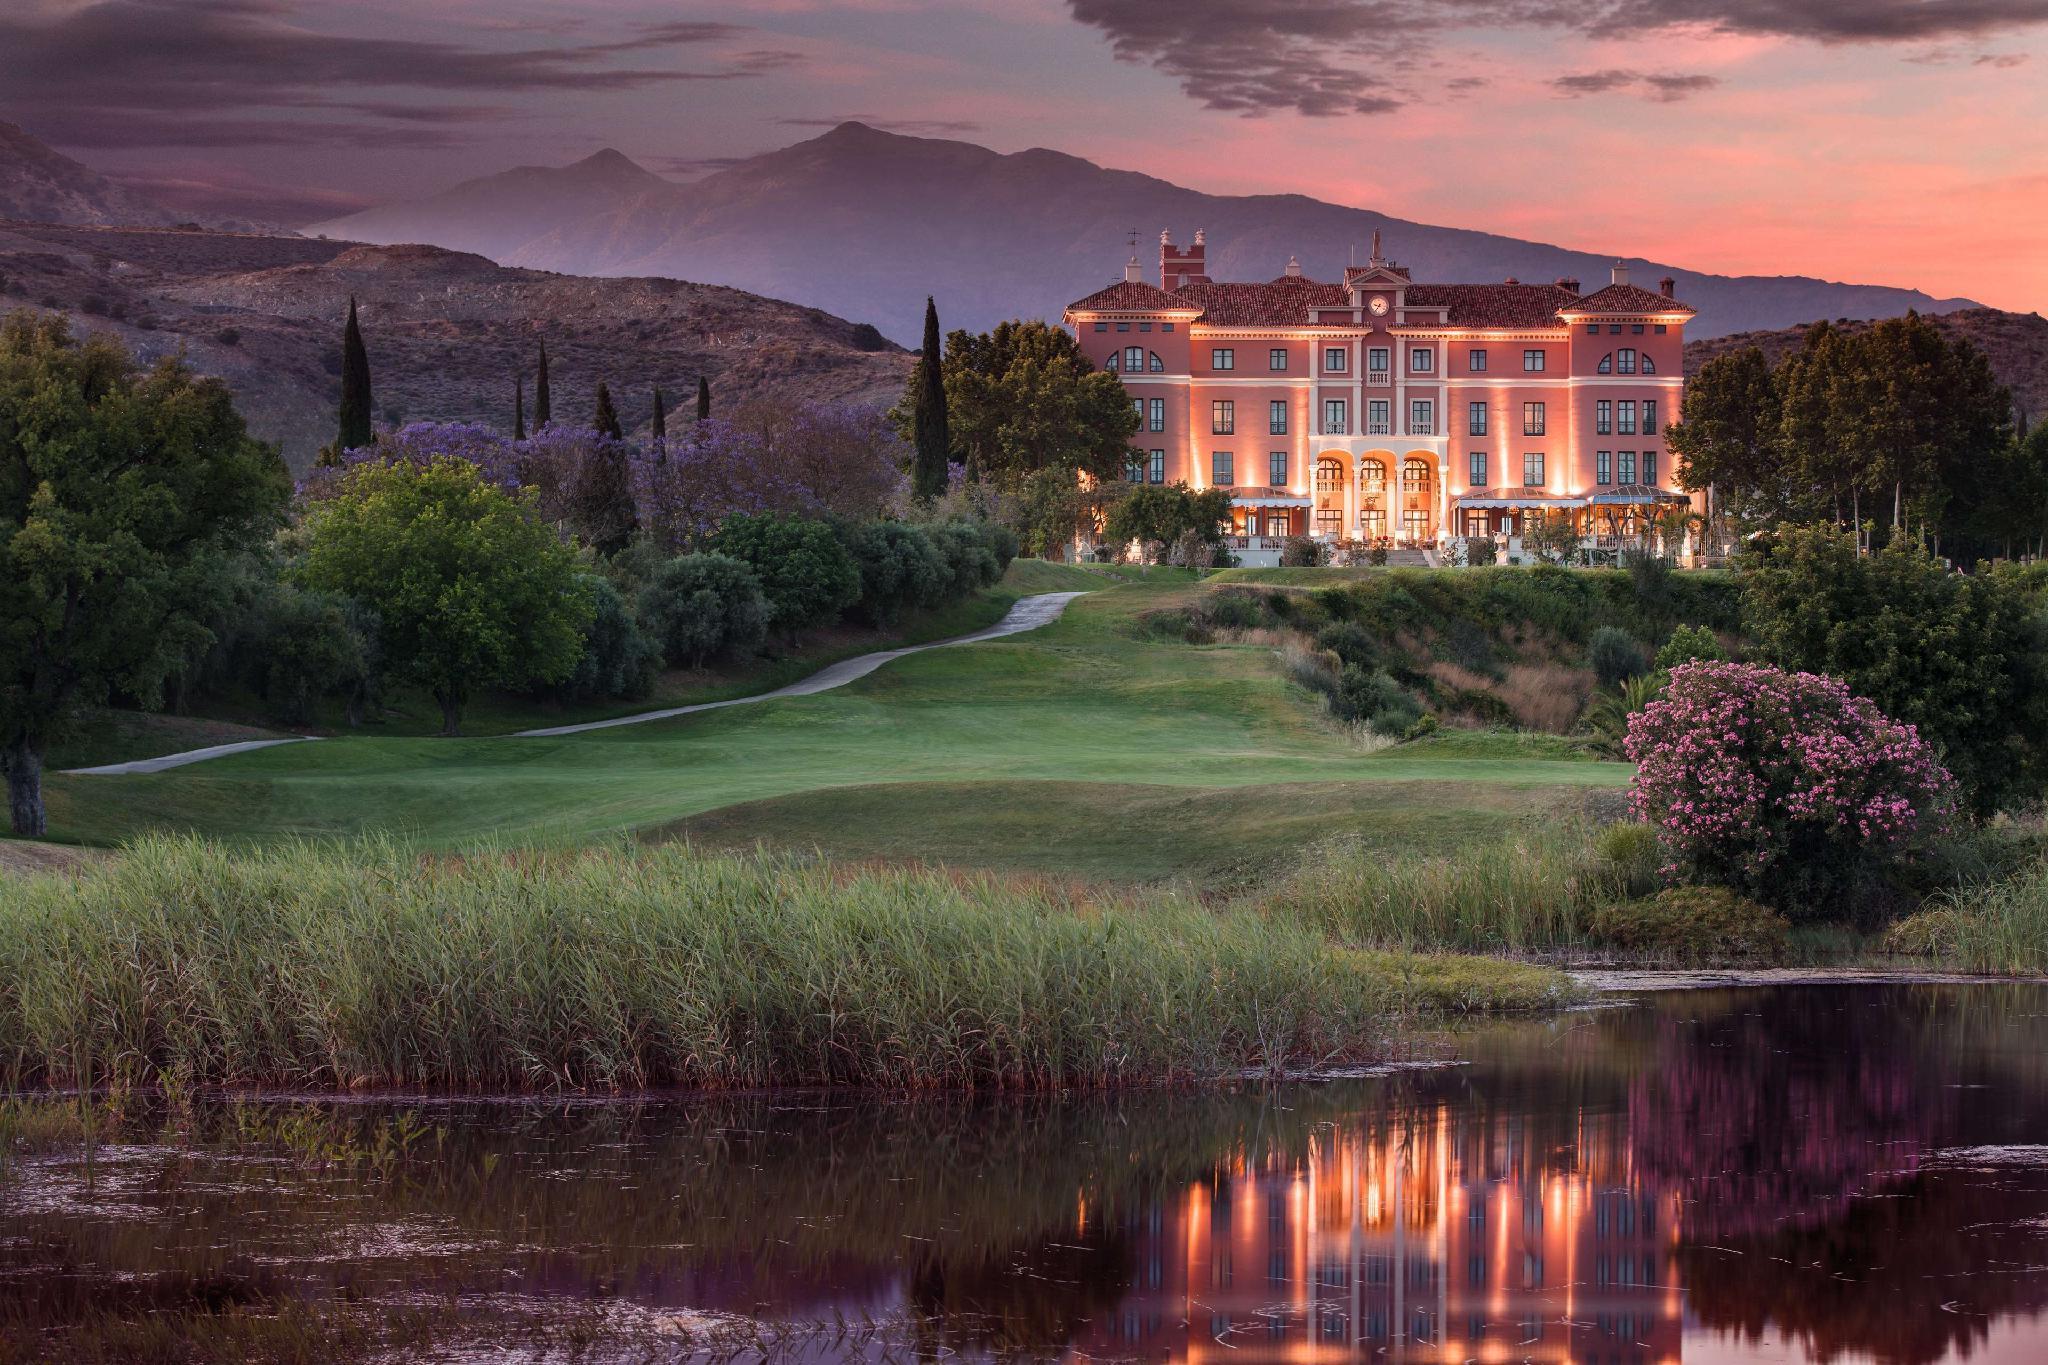 Anantara Villa Padierna Palace Benahavis Marbella Resort – The Leading Hotels of the World